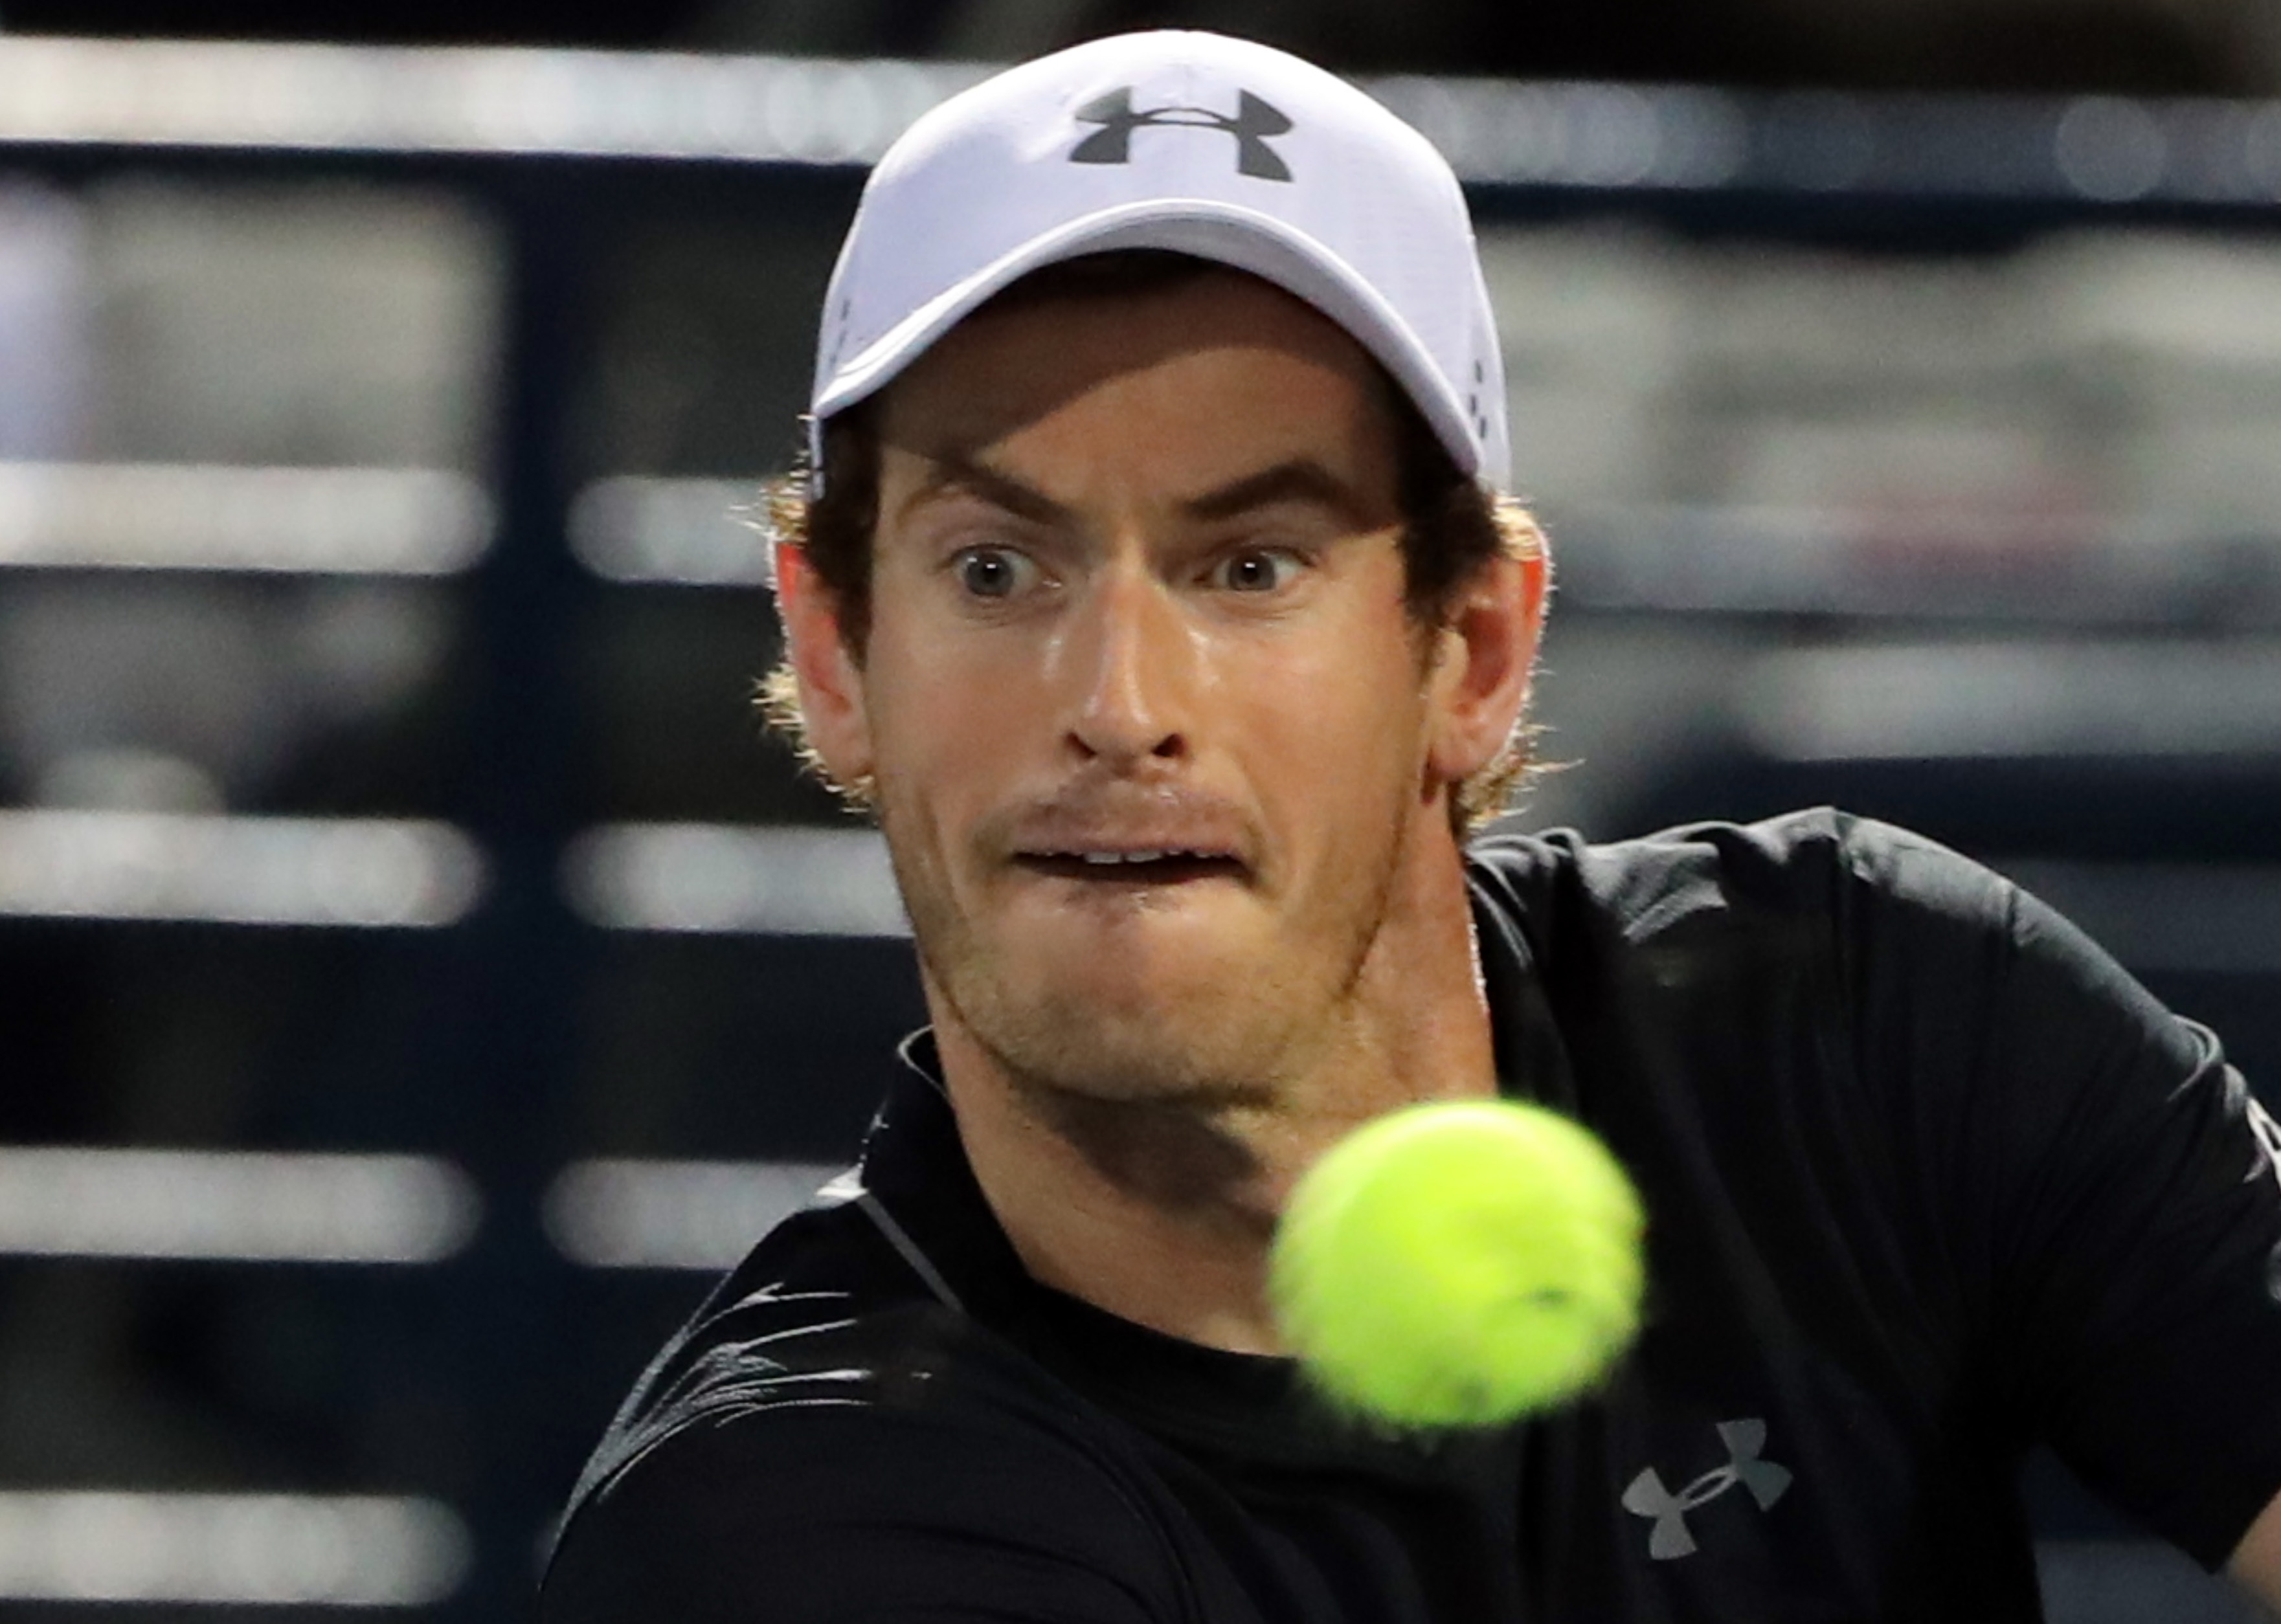 Andy Murray survives epic 20-18 tie-break to reach semi-final of Dubai Duty Free Tennis Championships